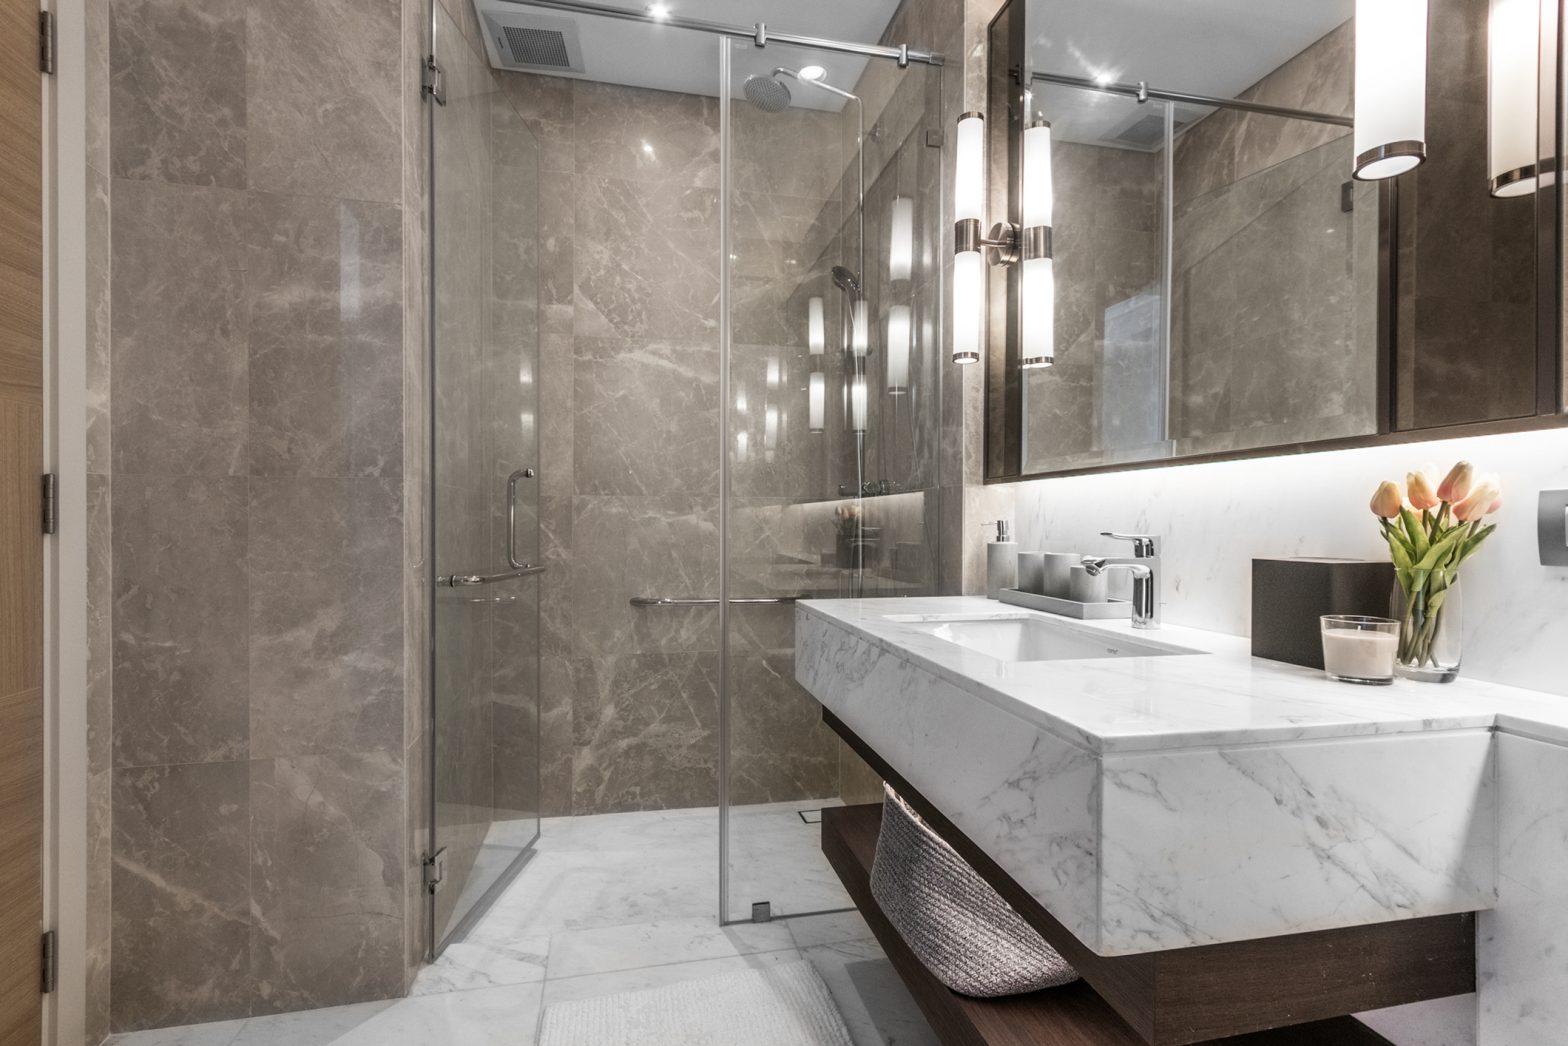 Shower Or Tub For Bathroom Remodel Kitchen Bath Galleria